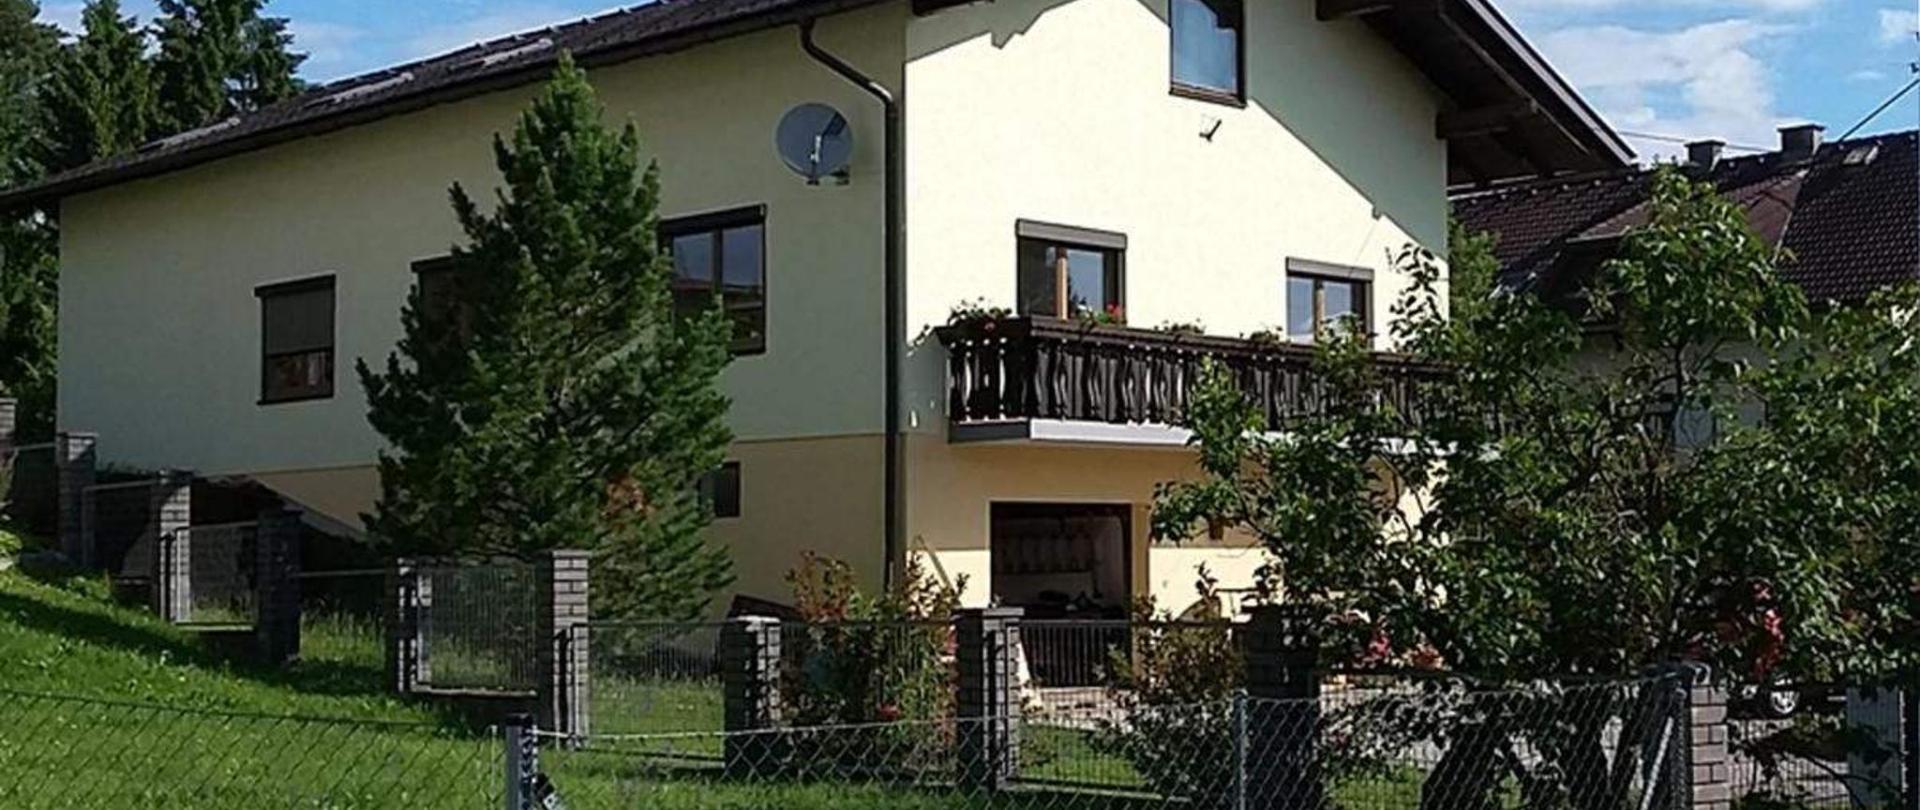 St. Jakob im Rosental - RiS-Kommunal - Startseite